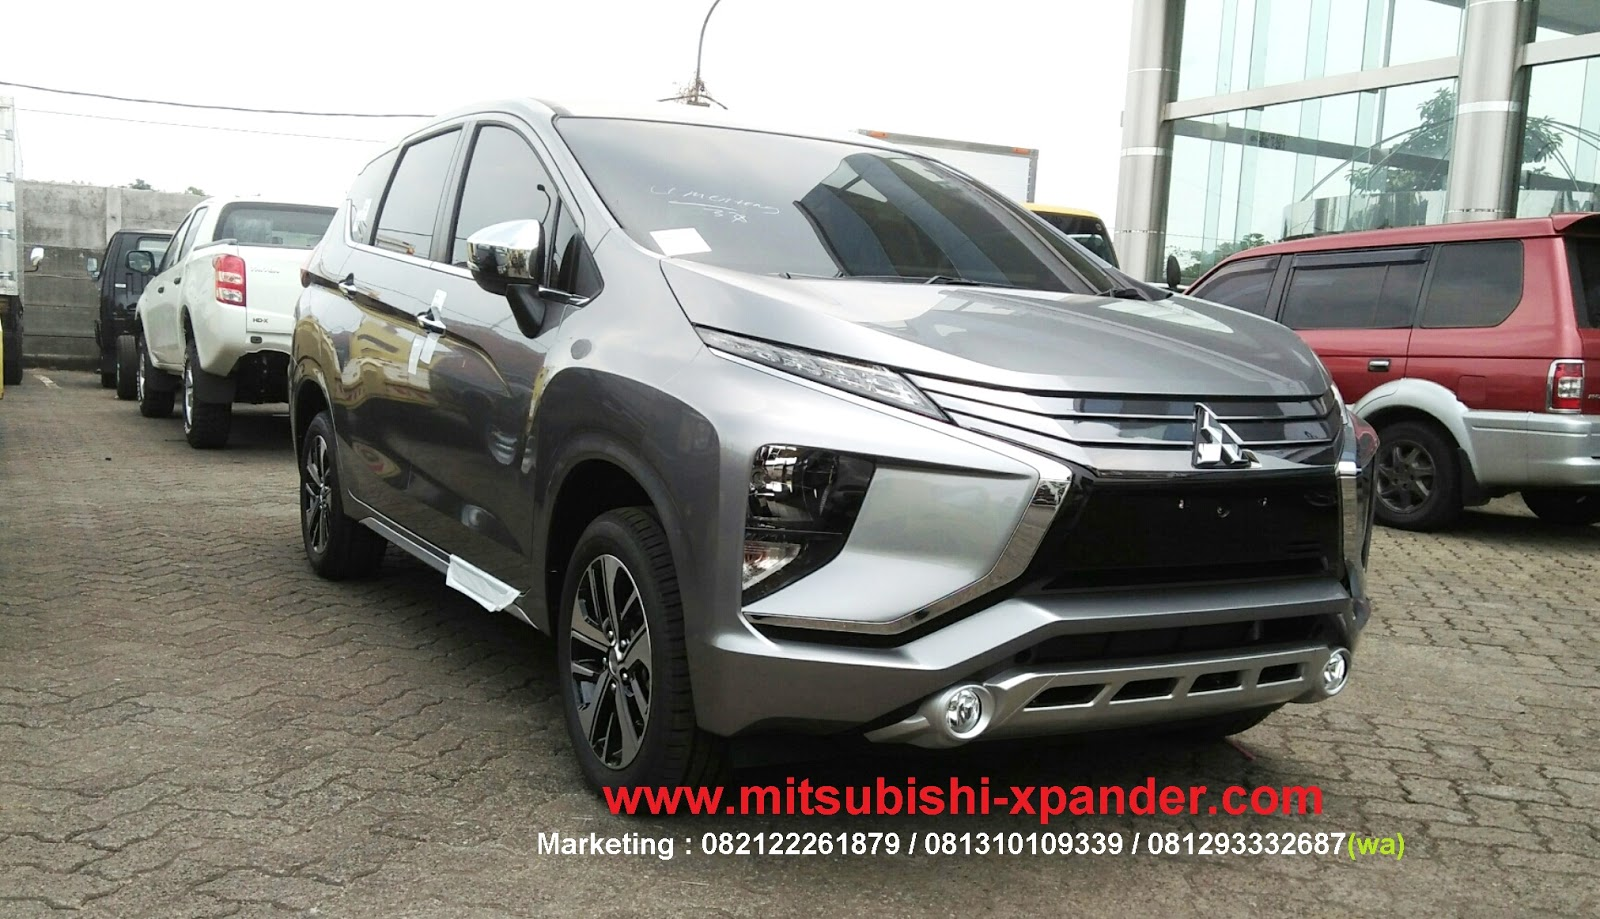 Grand New Avanza Vs Mitsubishi Xpander Yaris Trd Sportivo Cvt Titatium Grey Pictures To Pin On